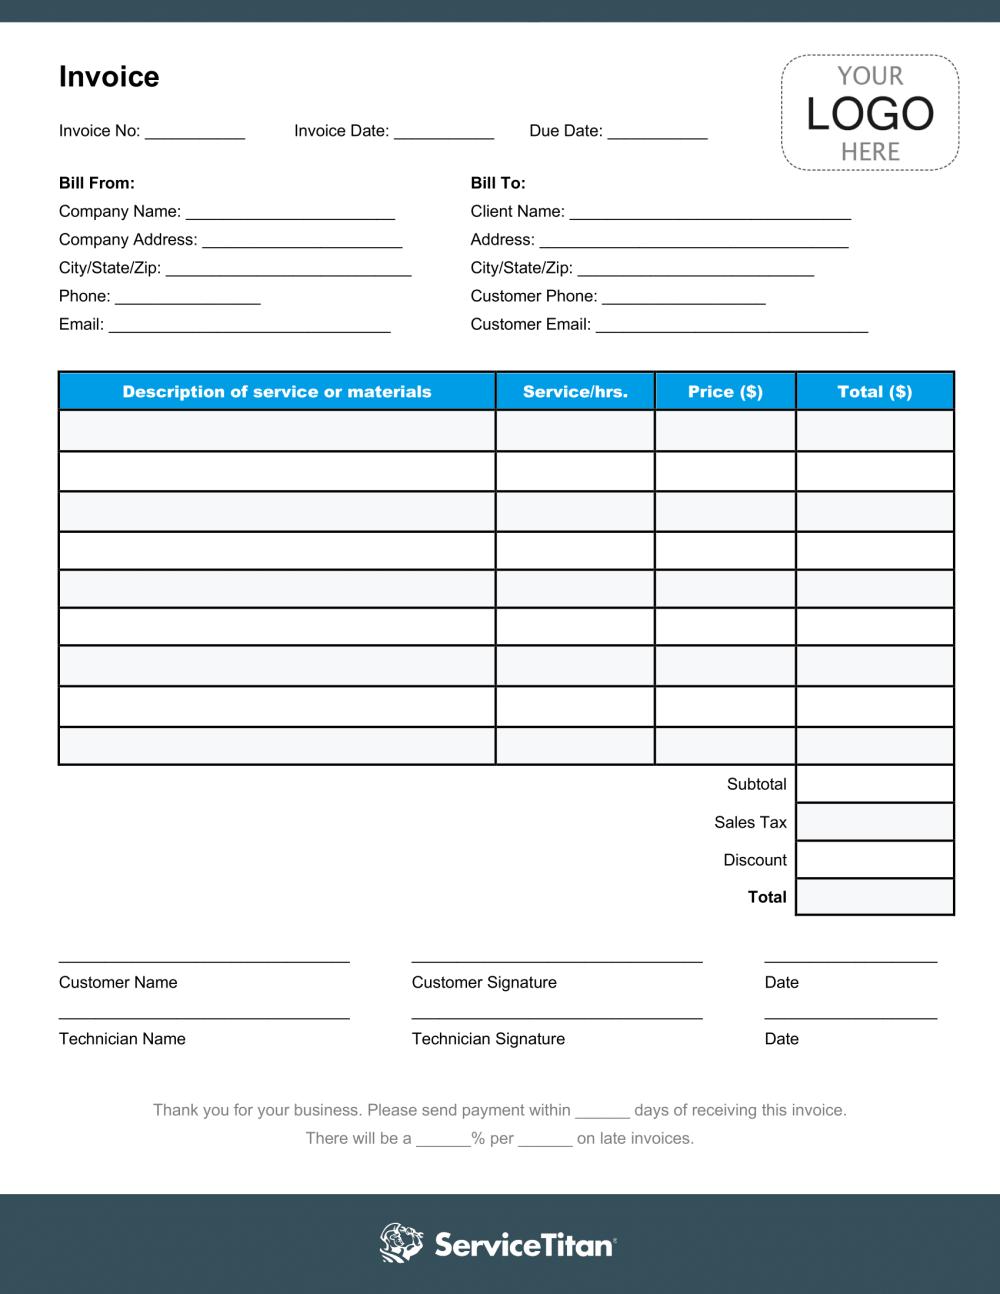 Free Hvac Invoice Template Pdf Plus Industry Best Practices